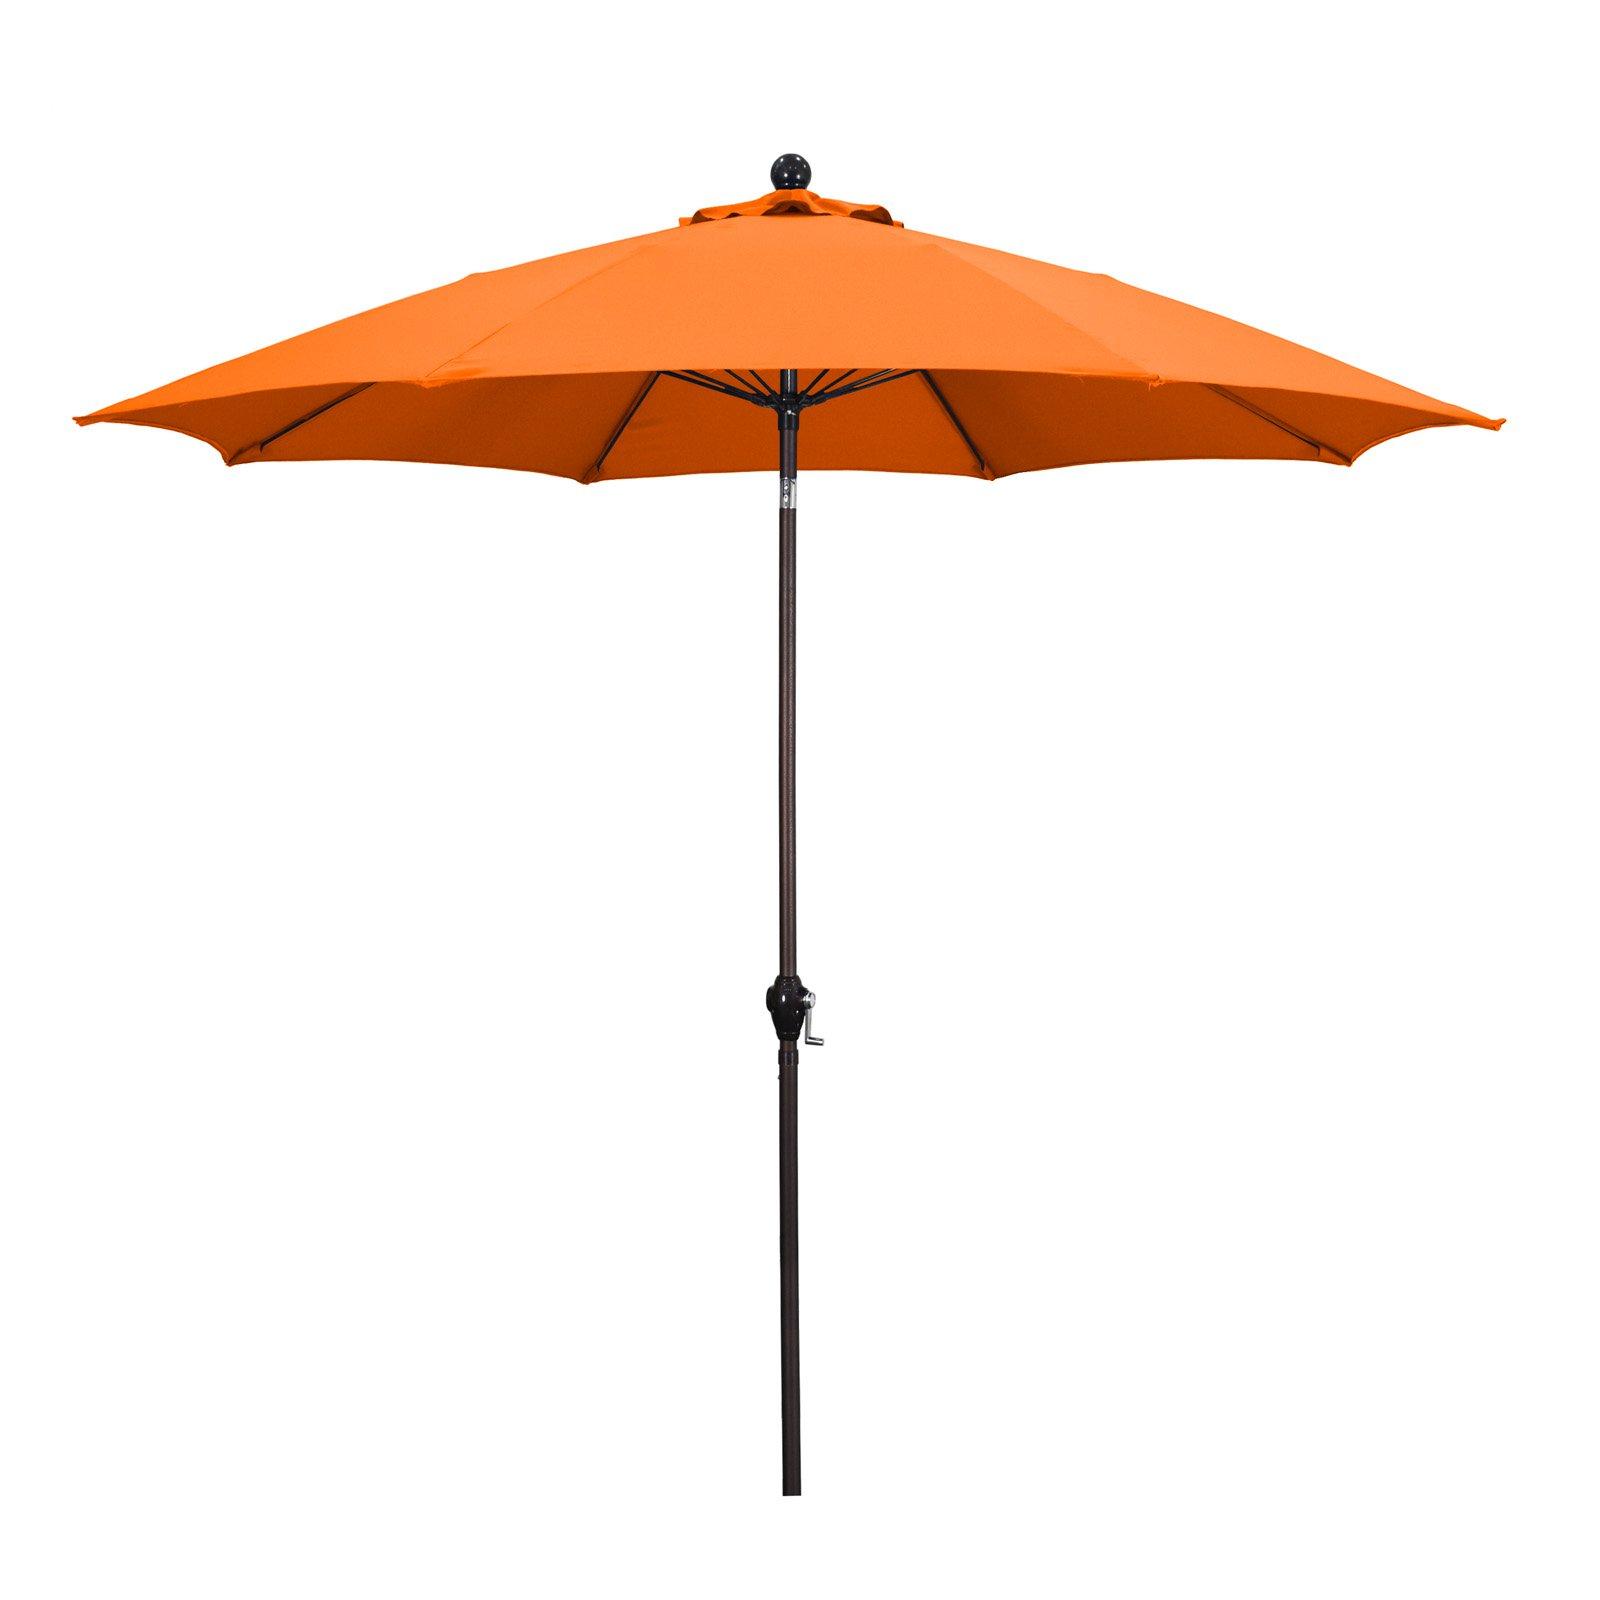 Newest Market Umbrellas With Sunline 9' Patio Market Umbrella In Polyester With Bronze Aluminum Pole Fiberglass Ribs 3 Way Tilt Crank Lift (View 11 of 20)